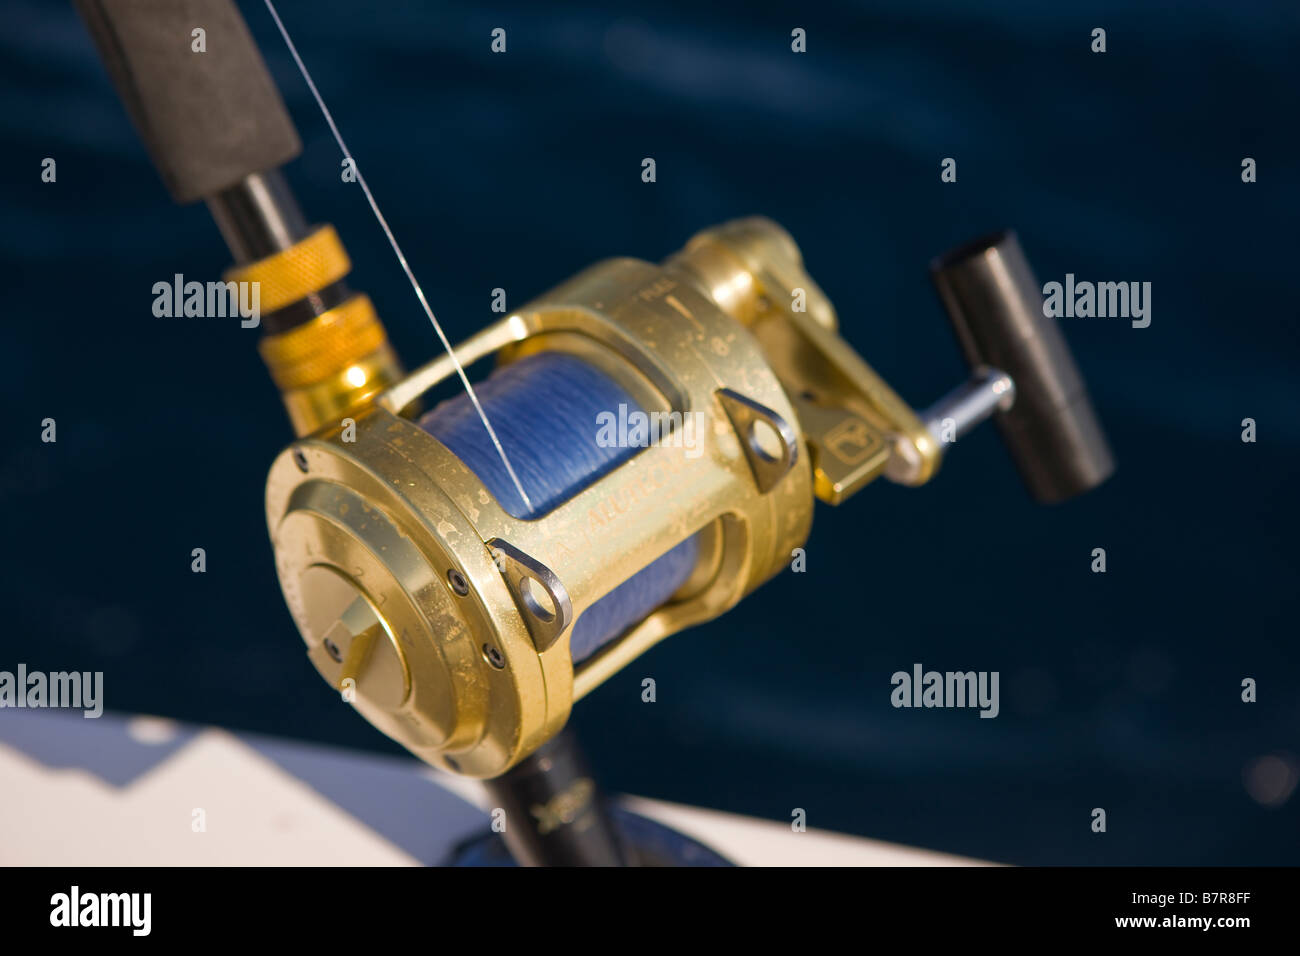 MIAMI BEACH FLORIDA USA - Brass fishing reel - Stock Image